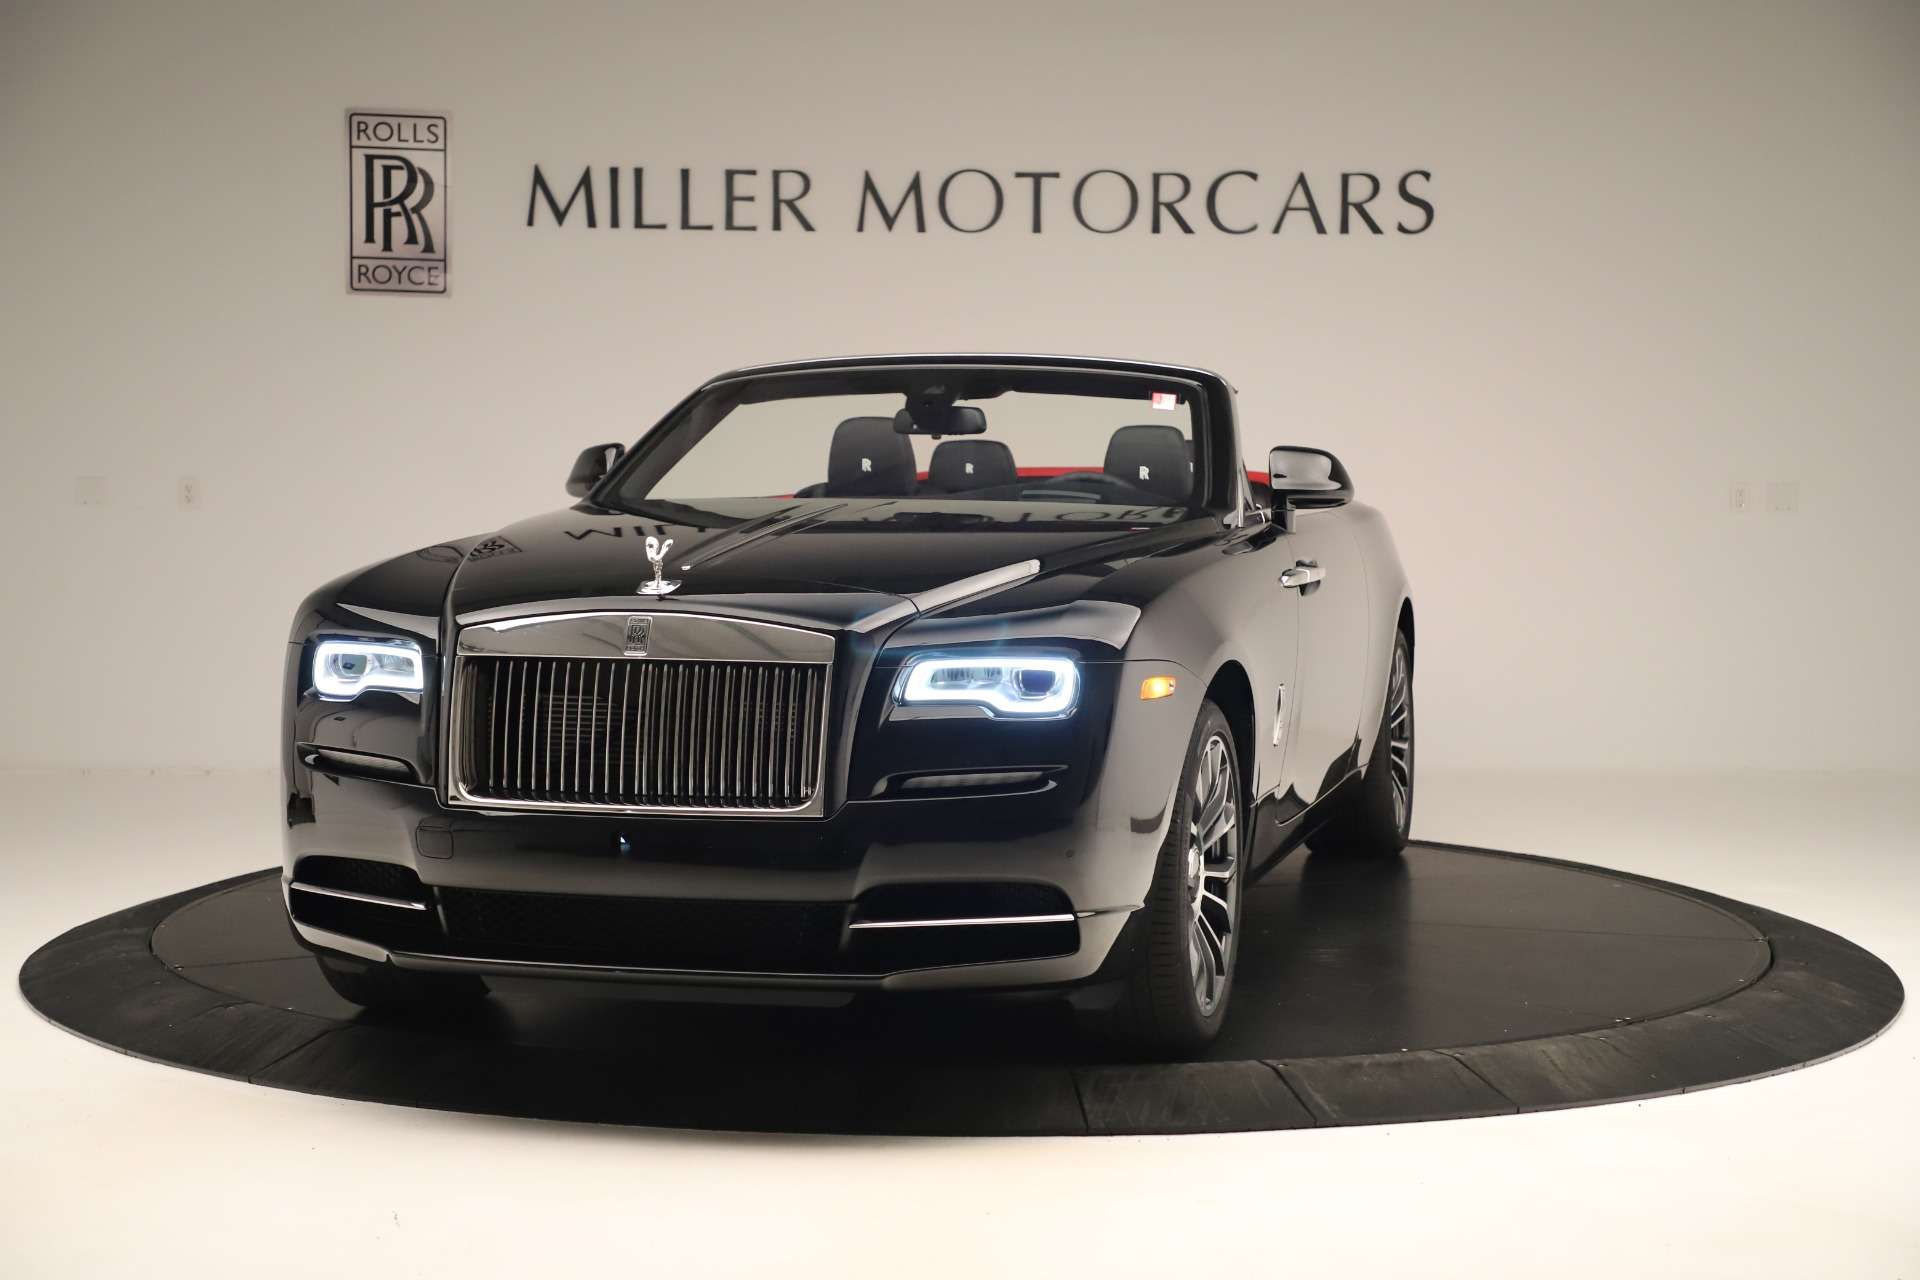 Used 2019 Rolls-Royce Dawn for sale $299,900 at Rolls-Royce Motor Cars Greenwich in Greenwich CT 06830 1